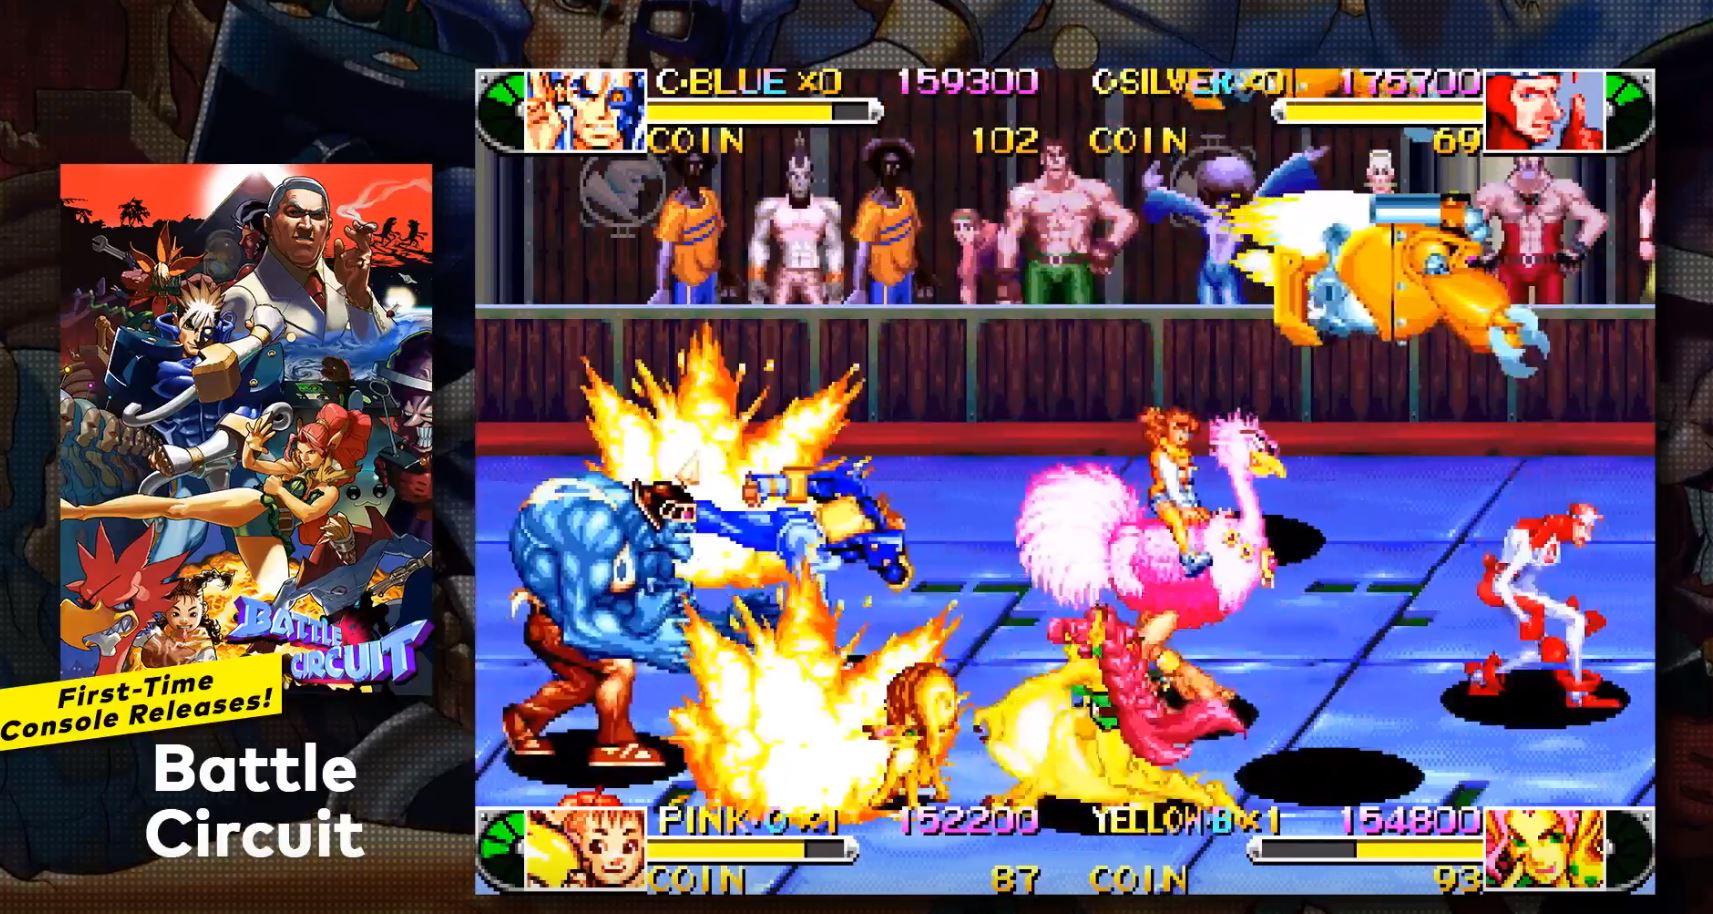 Capcom Beat Em Up Bundle Arrives On Nintendo Switch Next Week